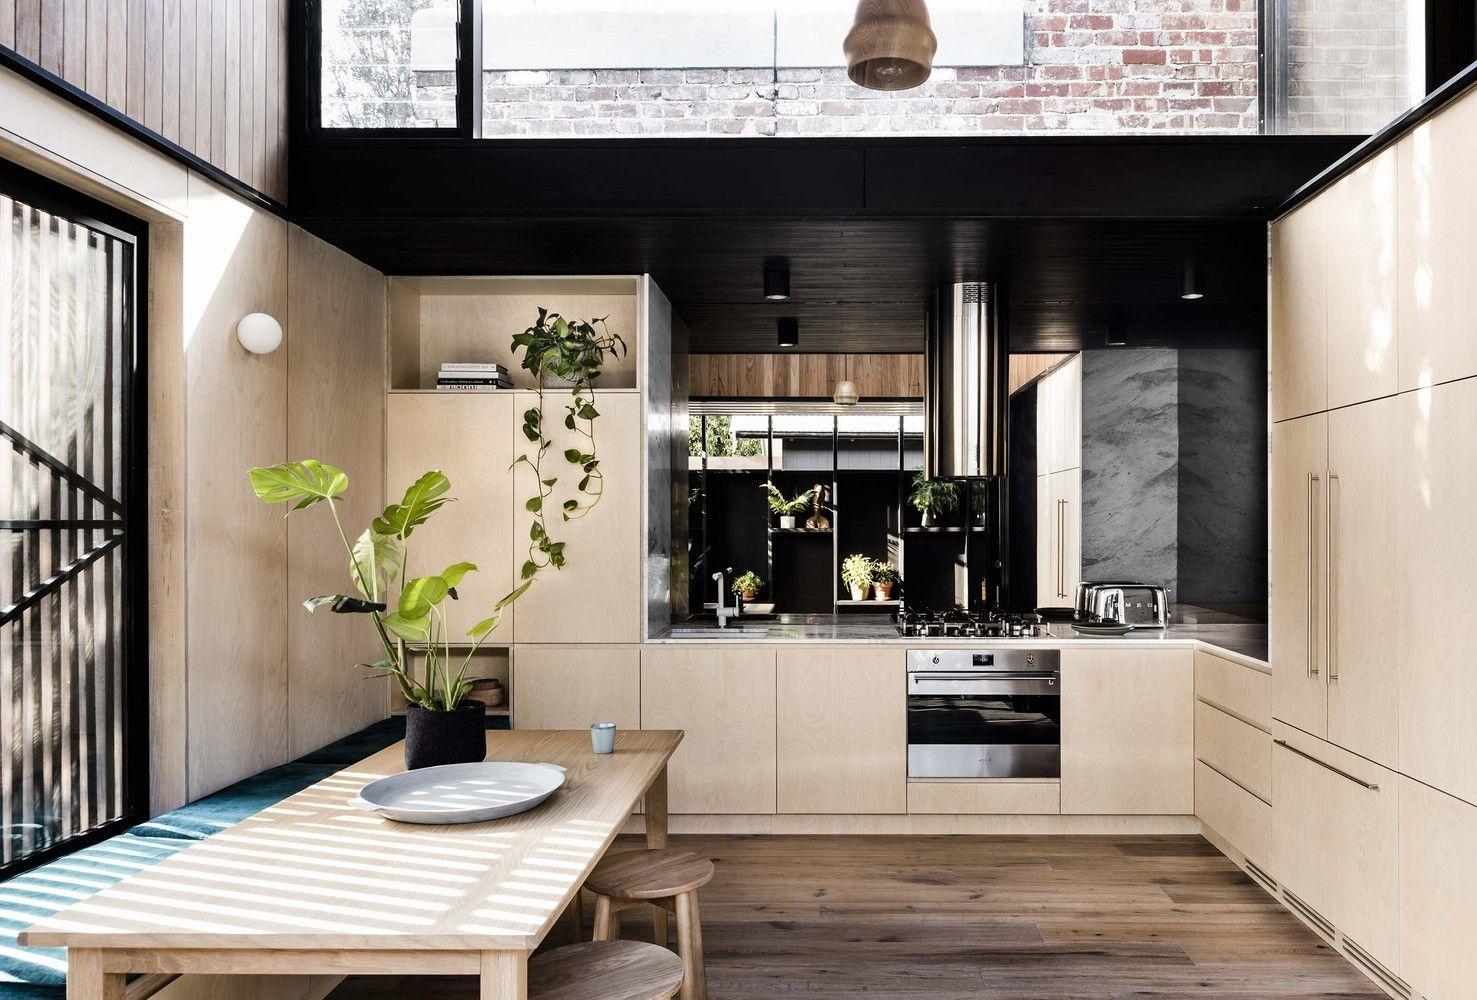 Gallery Of Light Corridor House Figr Architecture Design 5 Kitchen Design Kitchen Design Trends Kitchen Interior